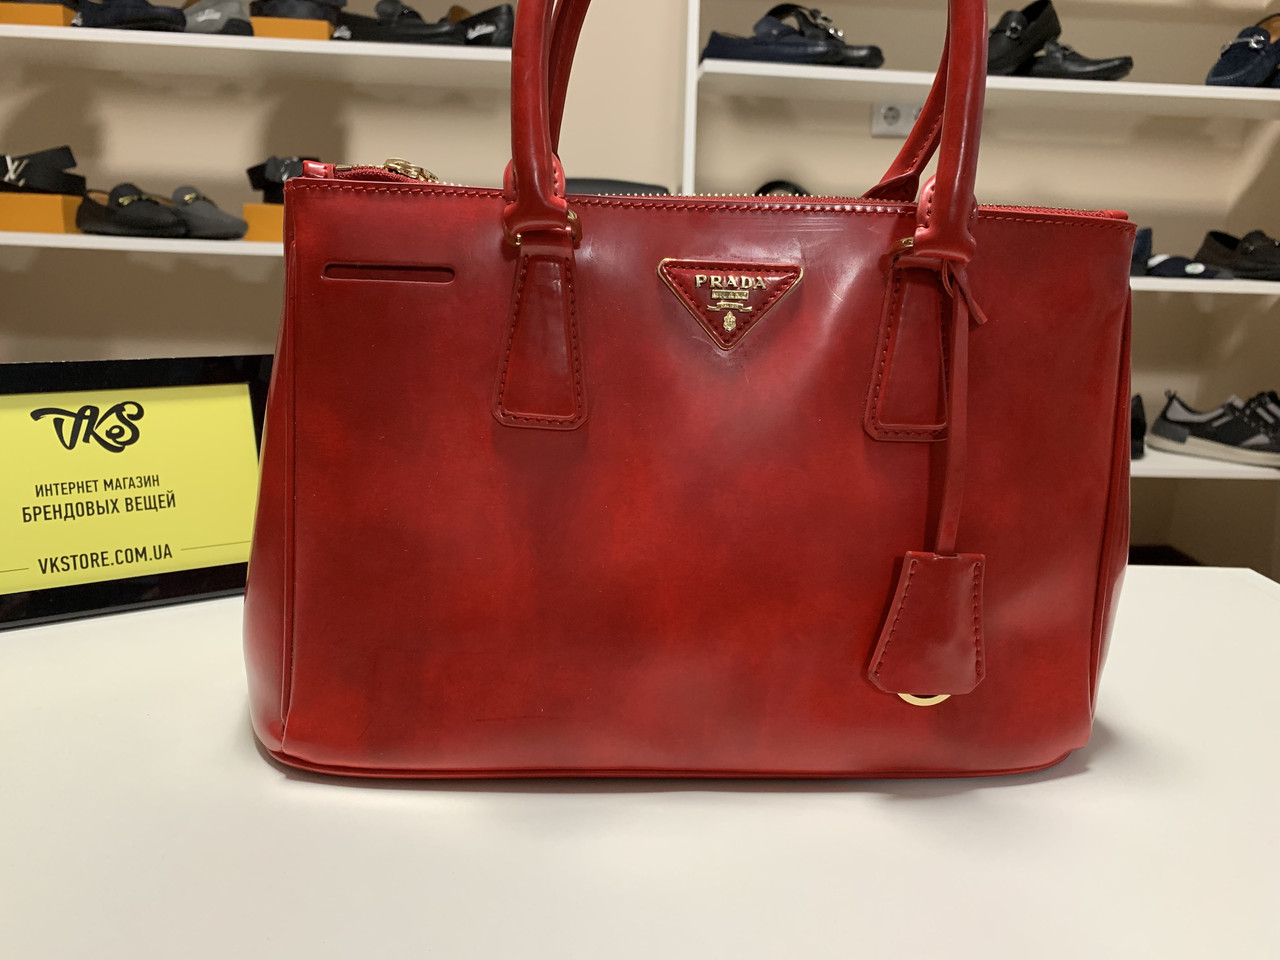 8986a8ef4ee8 Prada сумки интернет магазин - сумка бренд | vkstore.com.ua